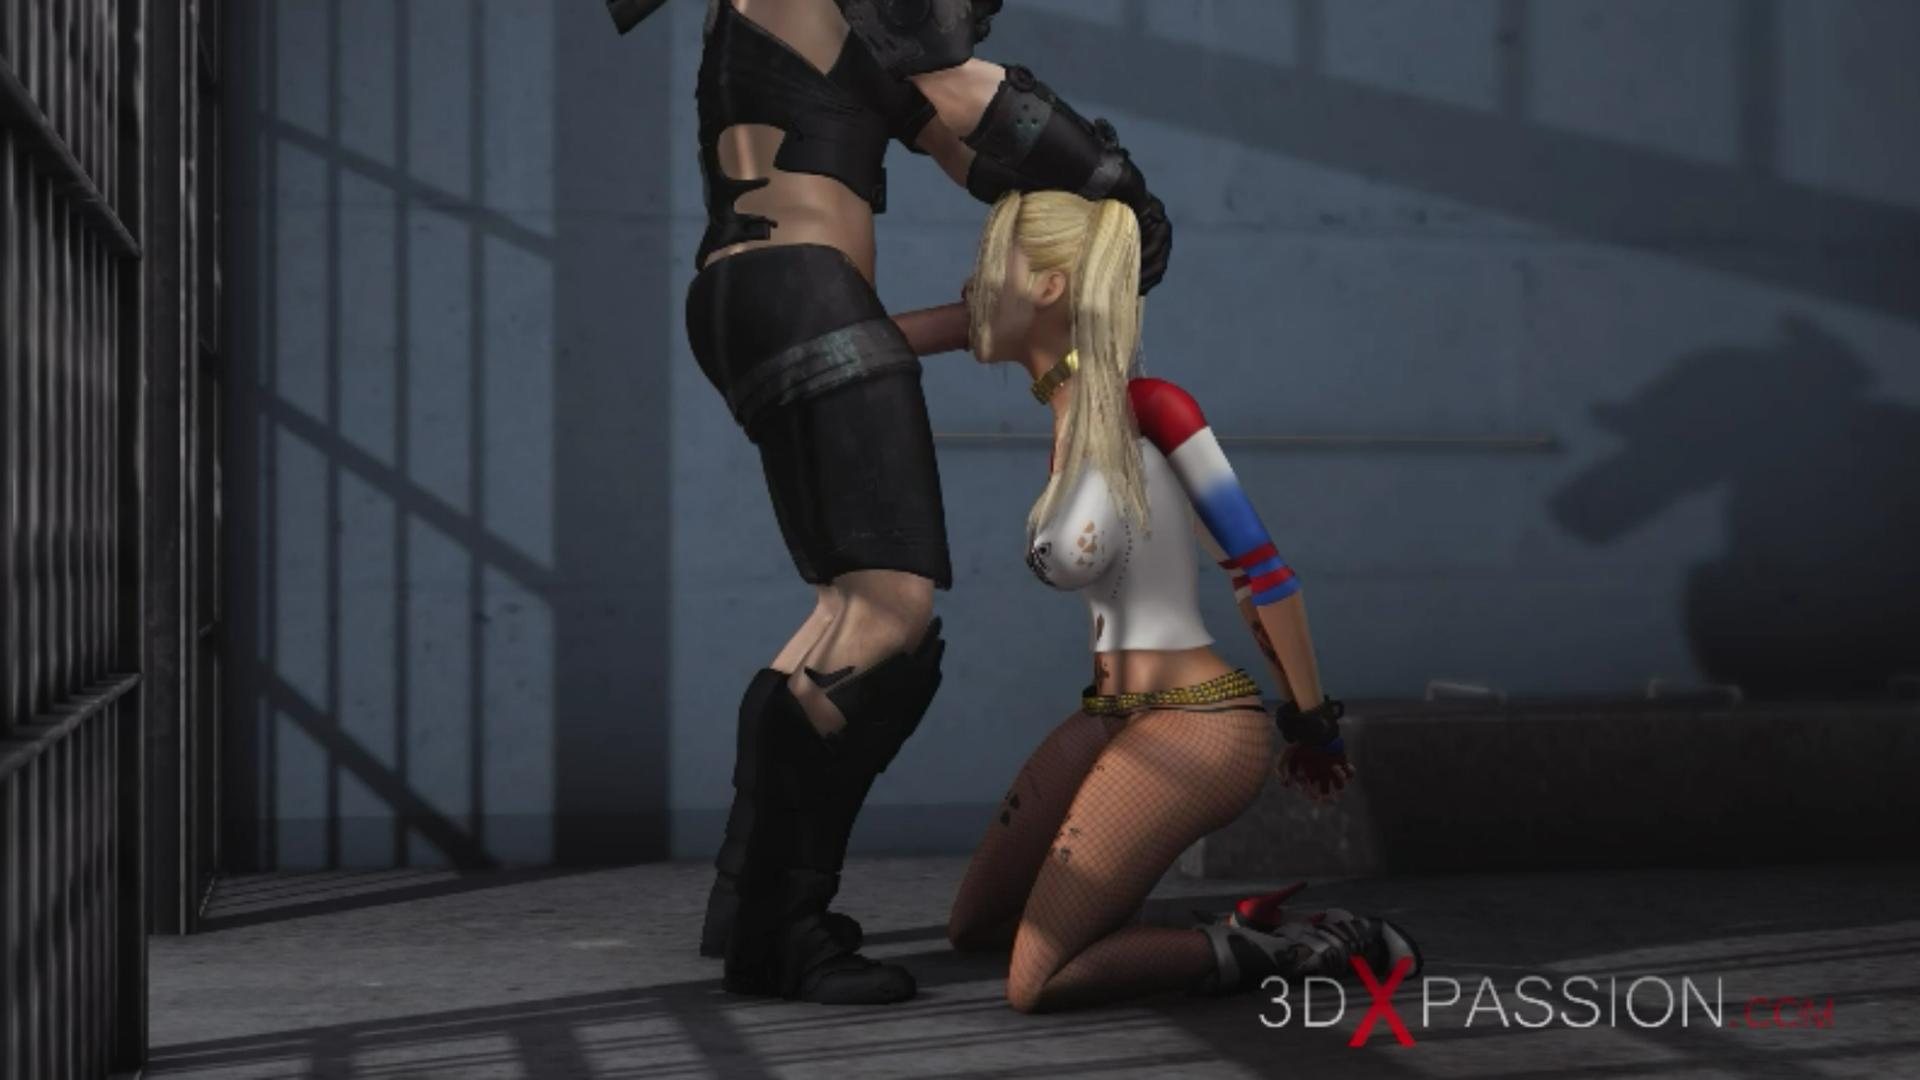 Batman fucks hard Harley Quinn in jail giving extreme blowjob